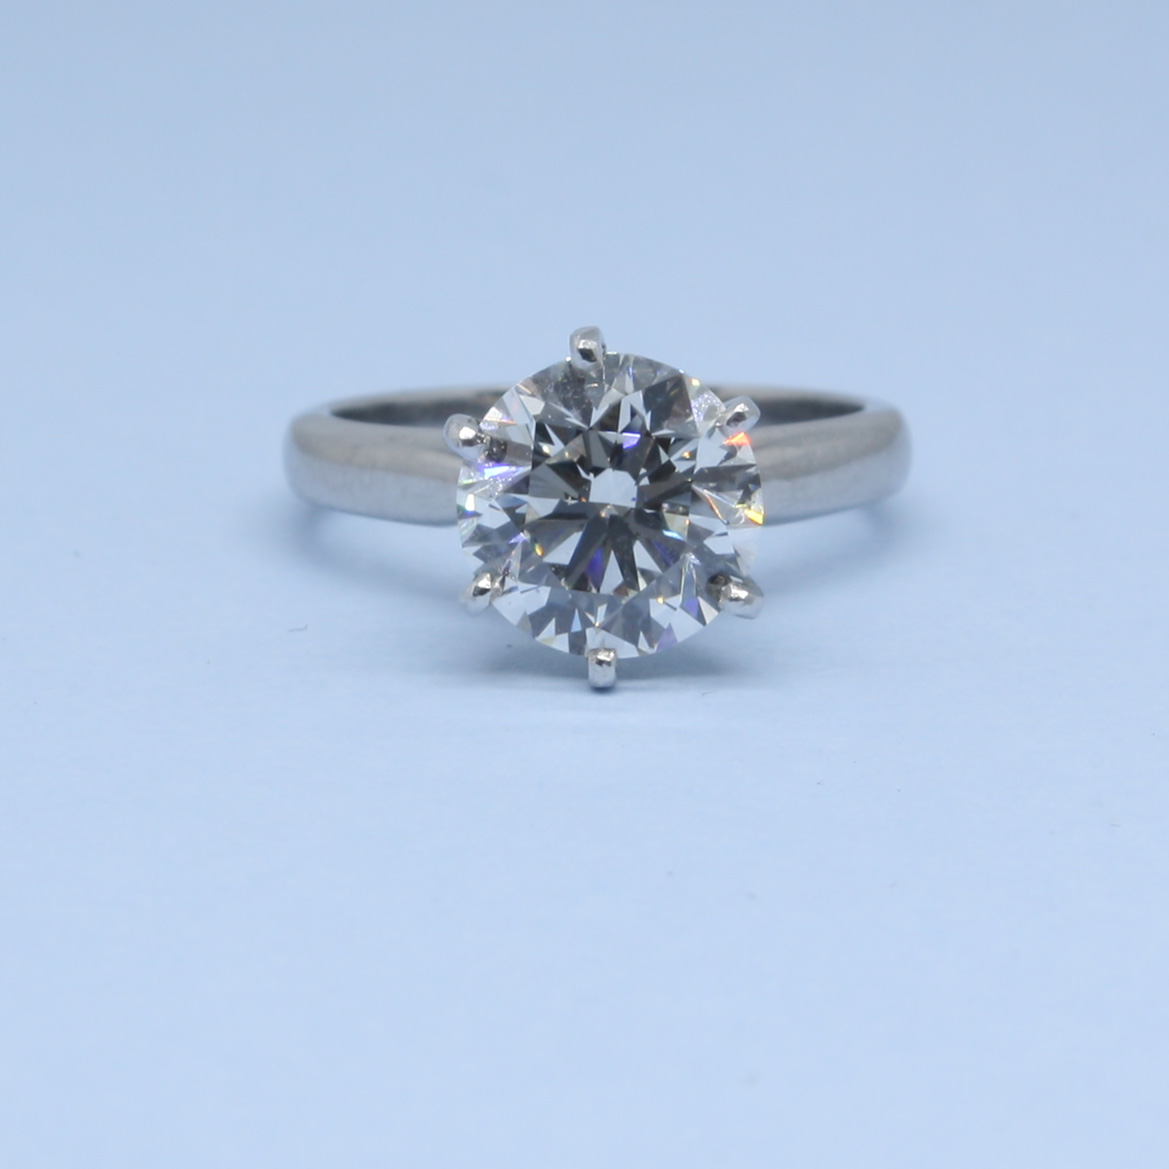 3.03ct GIA Certificated Brilliant Cut Diamond Ring